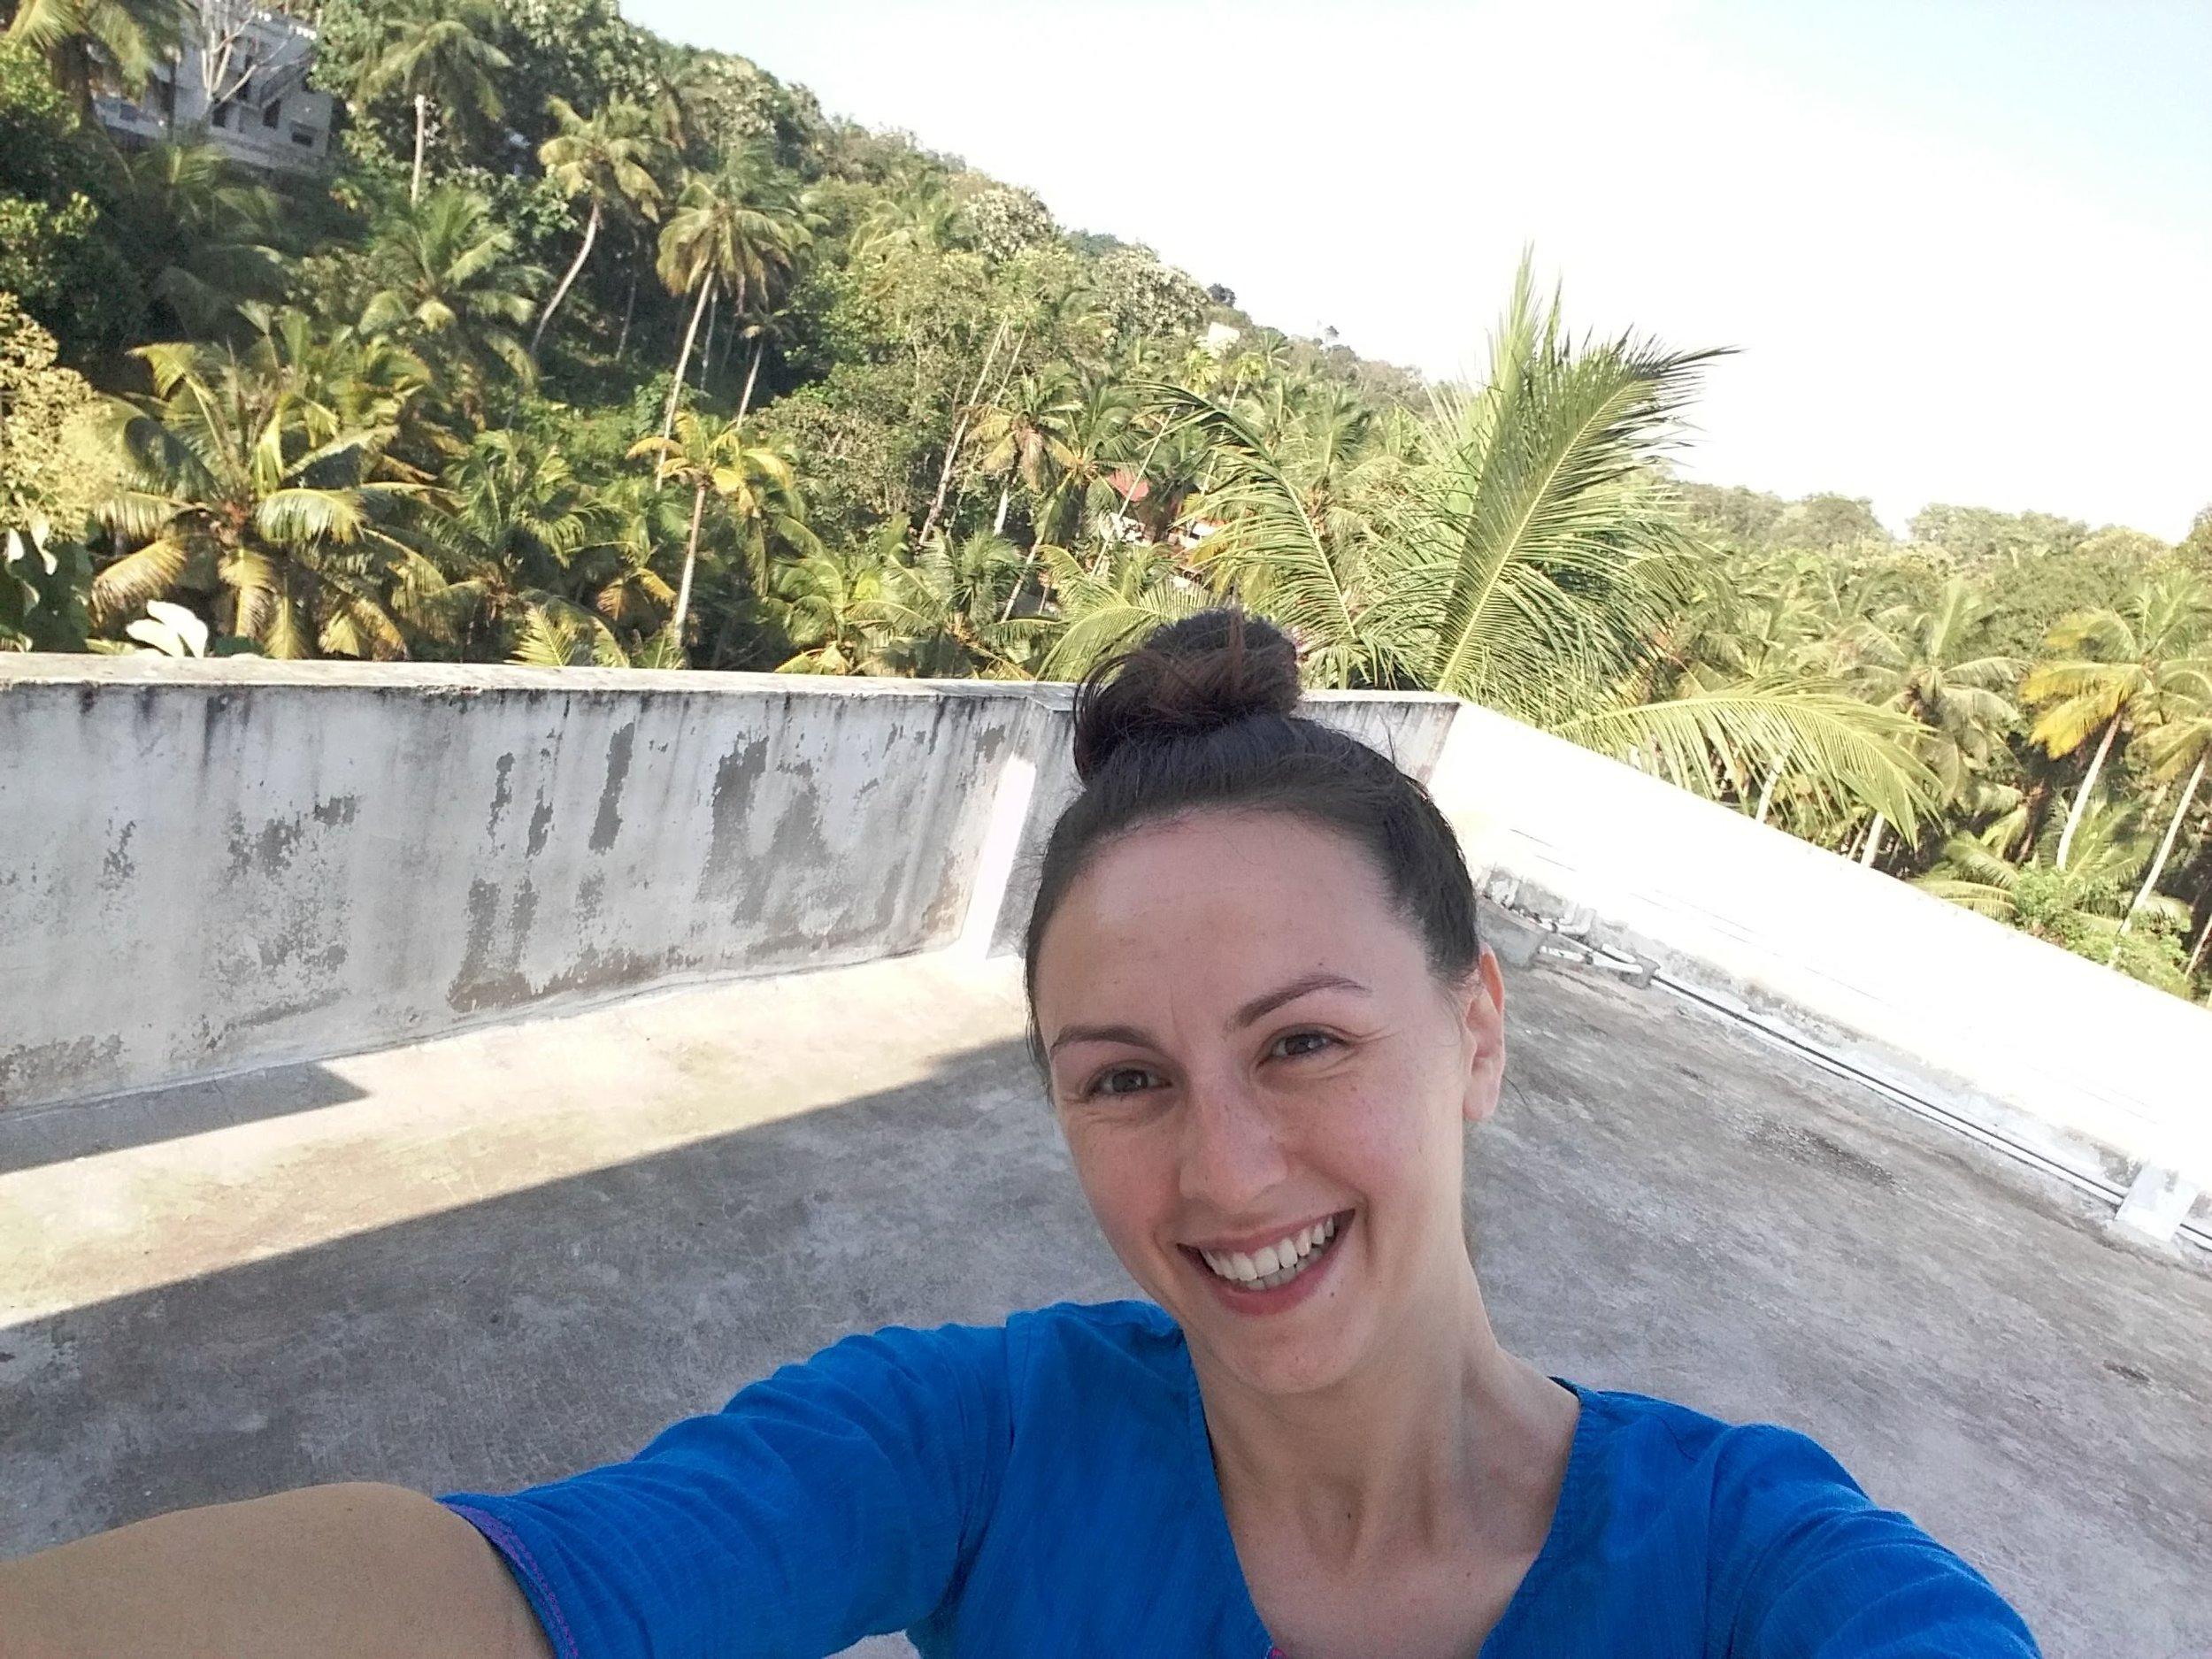 cursuri yoga in cluj